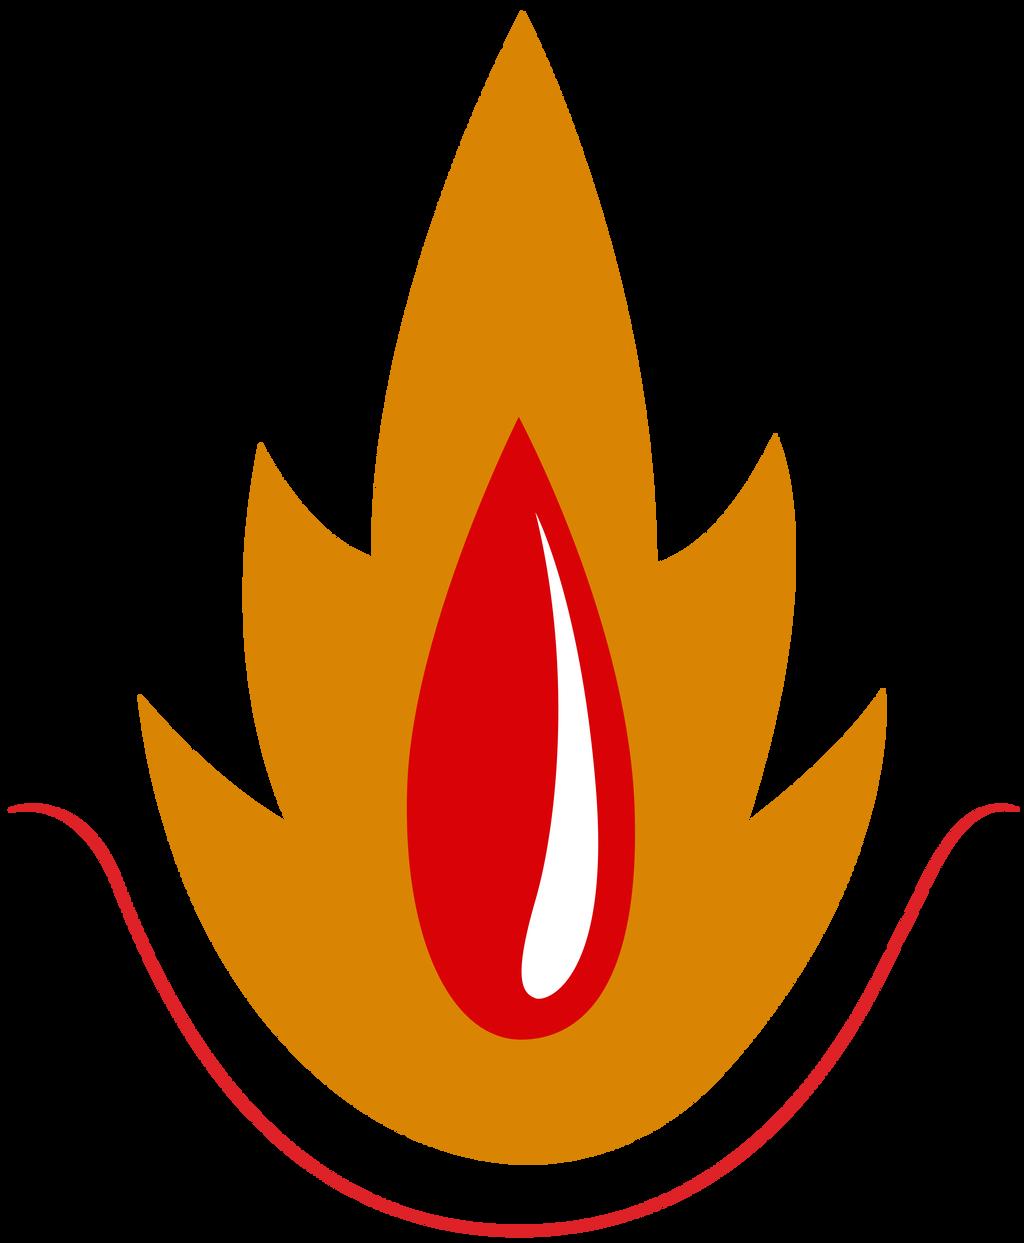 fire cutie marks - photo #16